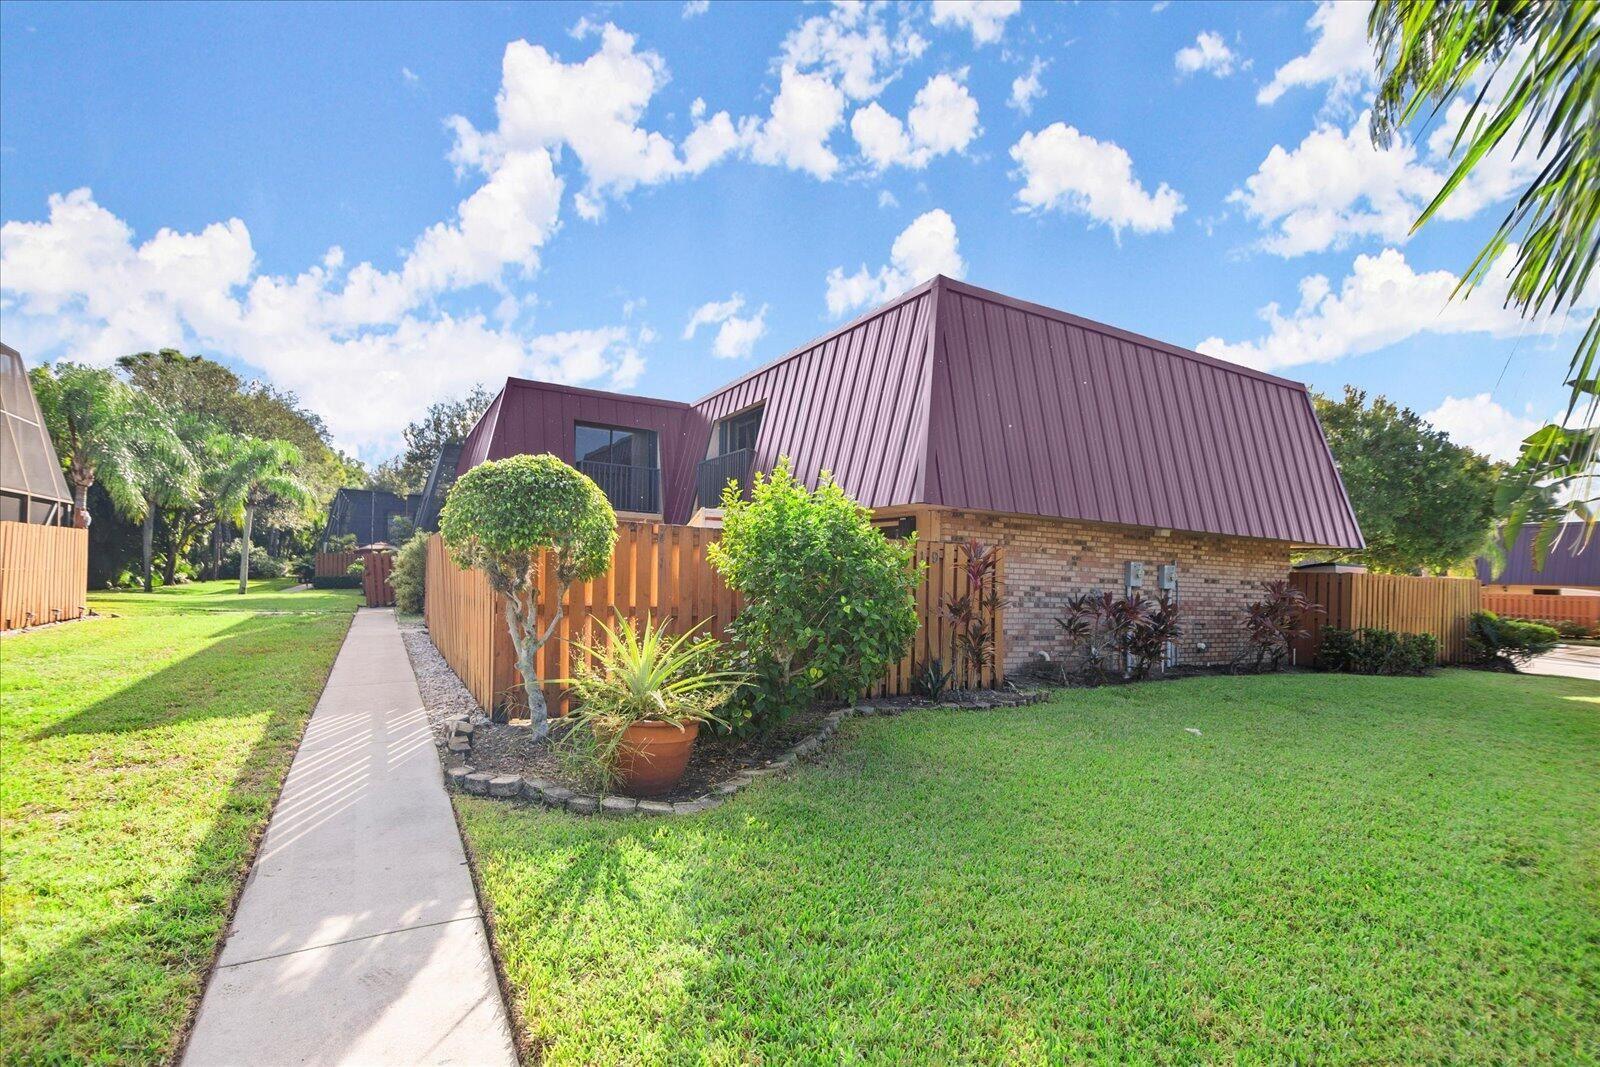 Photo of 6119 SE Windsong Lane, Stuart, FL 34997 (MLS # RX-10753051)